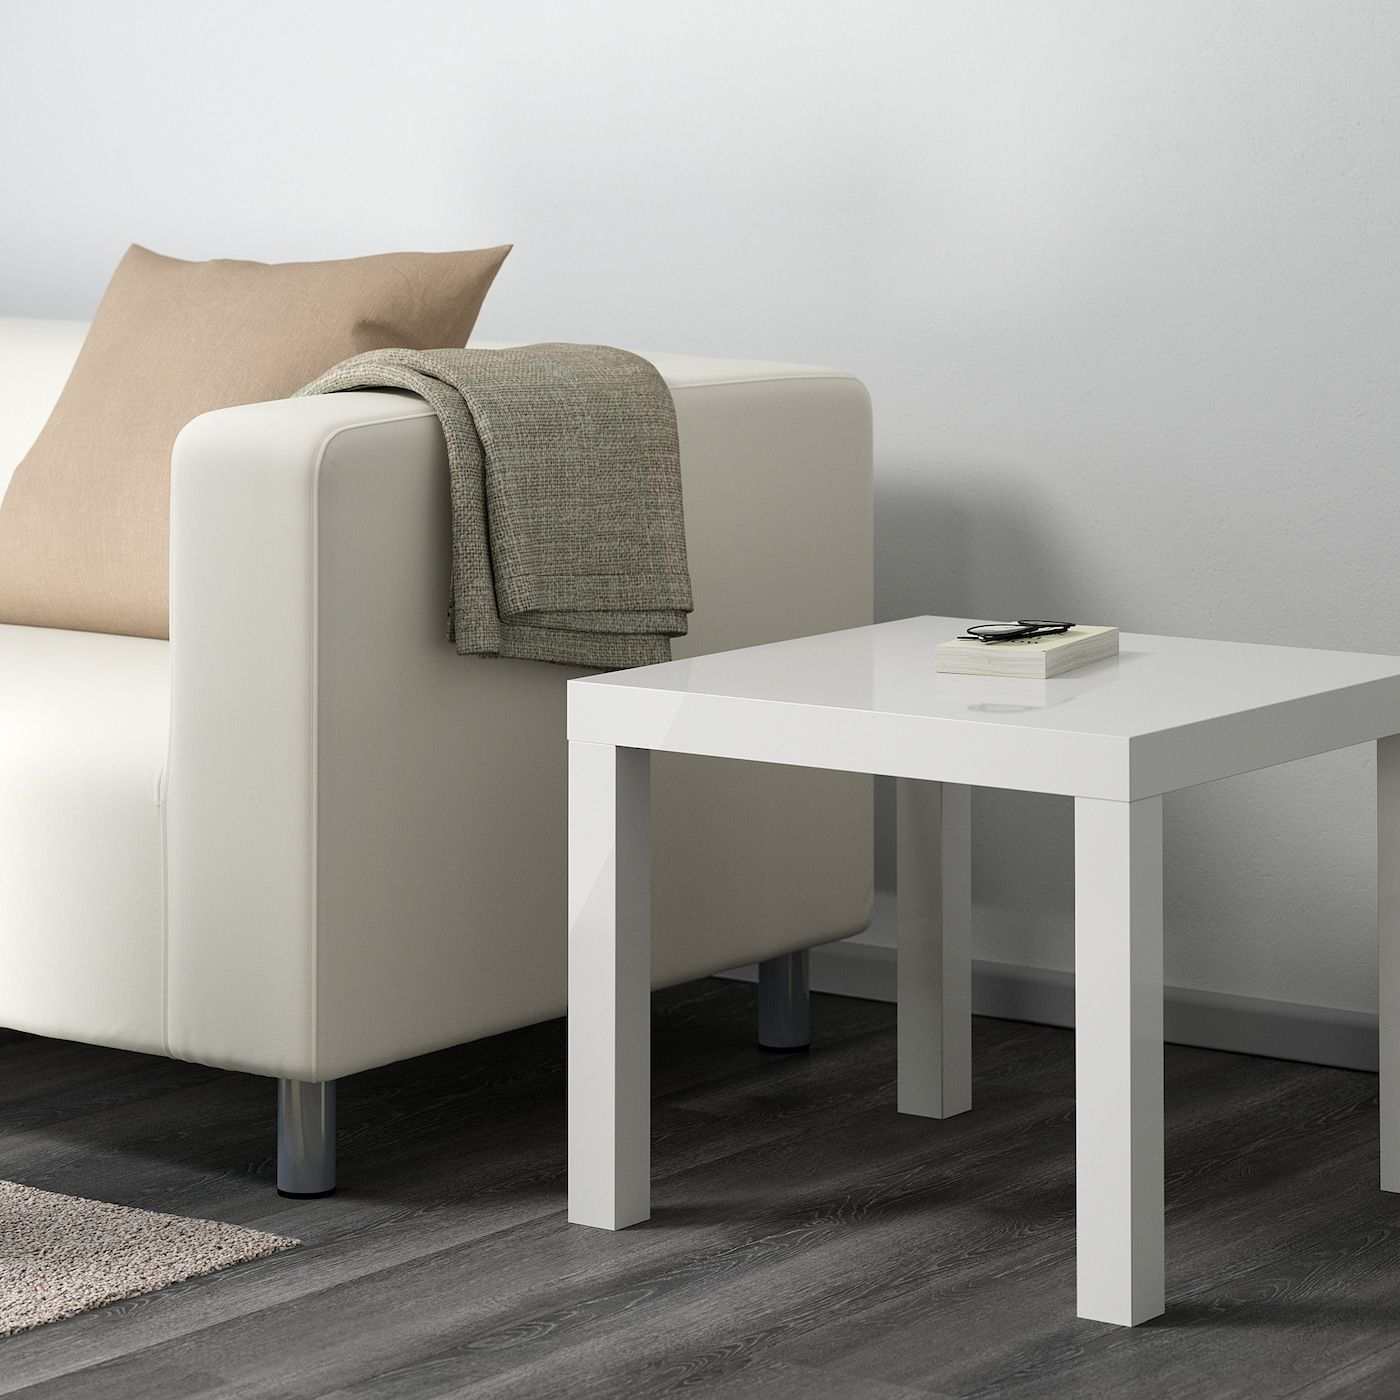 Lack Side Table High Gloss White Ikea In 2020 Ikea Side Table Ikea Lack Side Table Ikea Lack Table [ 1400 x 1400 Pixel ]